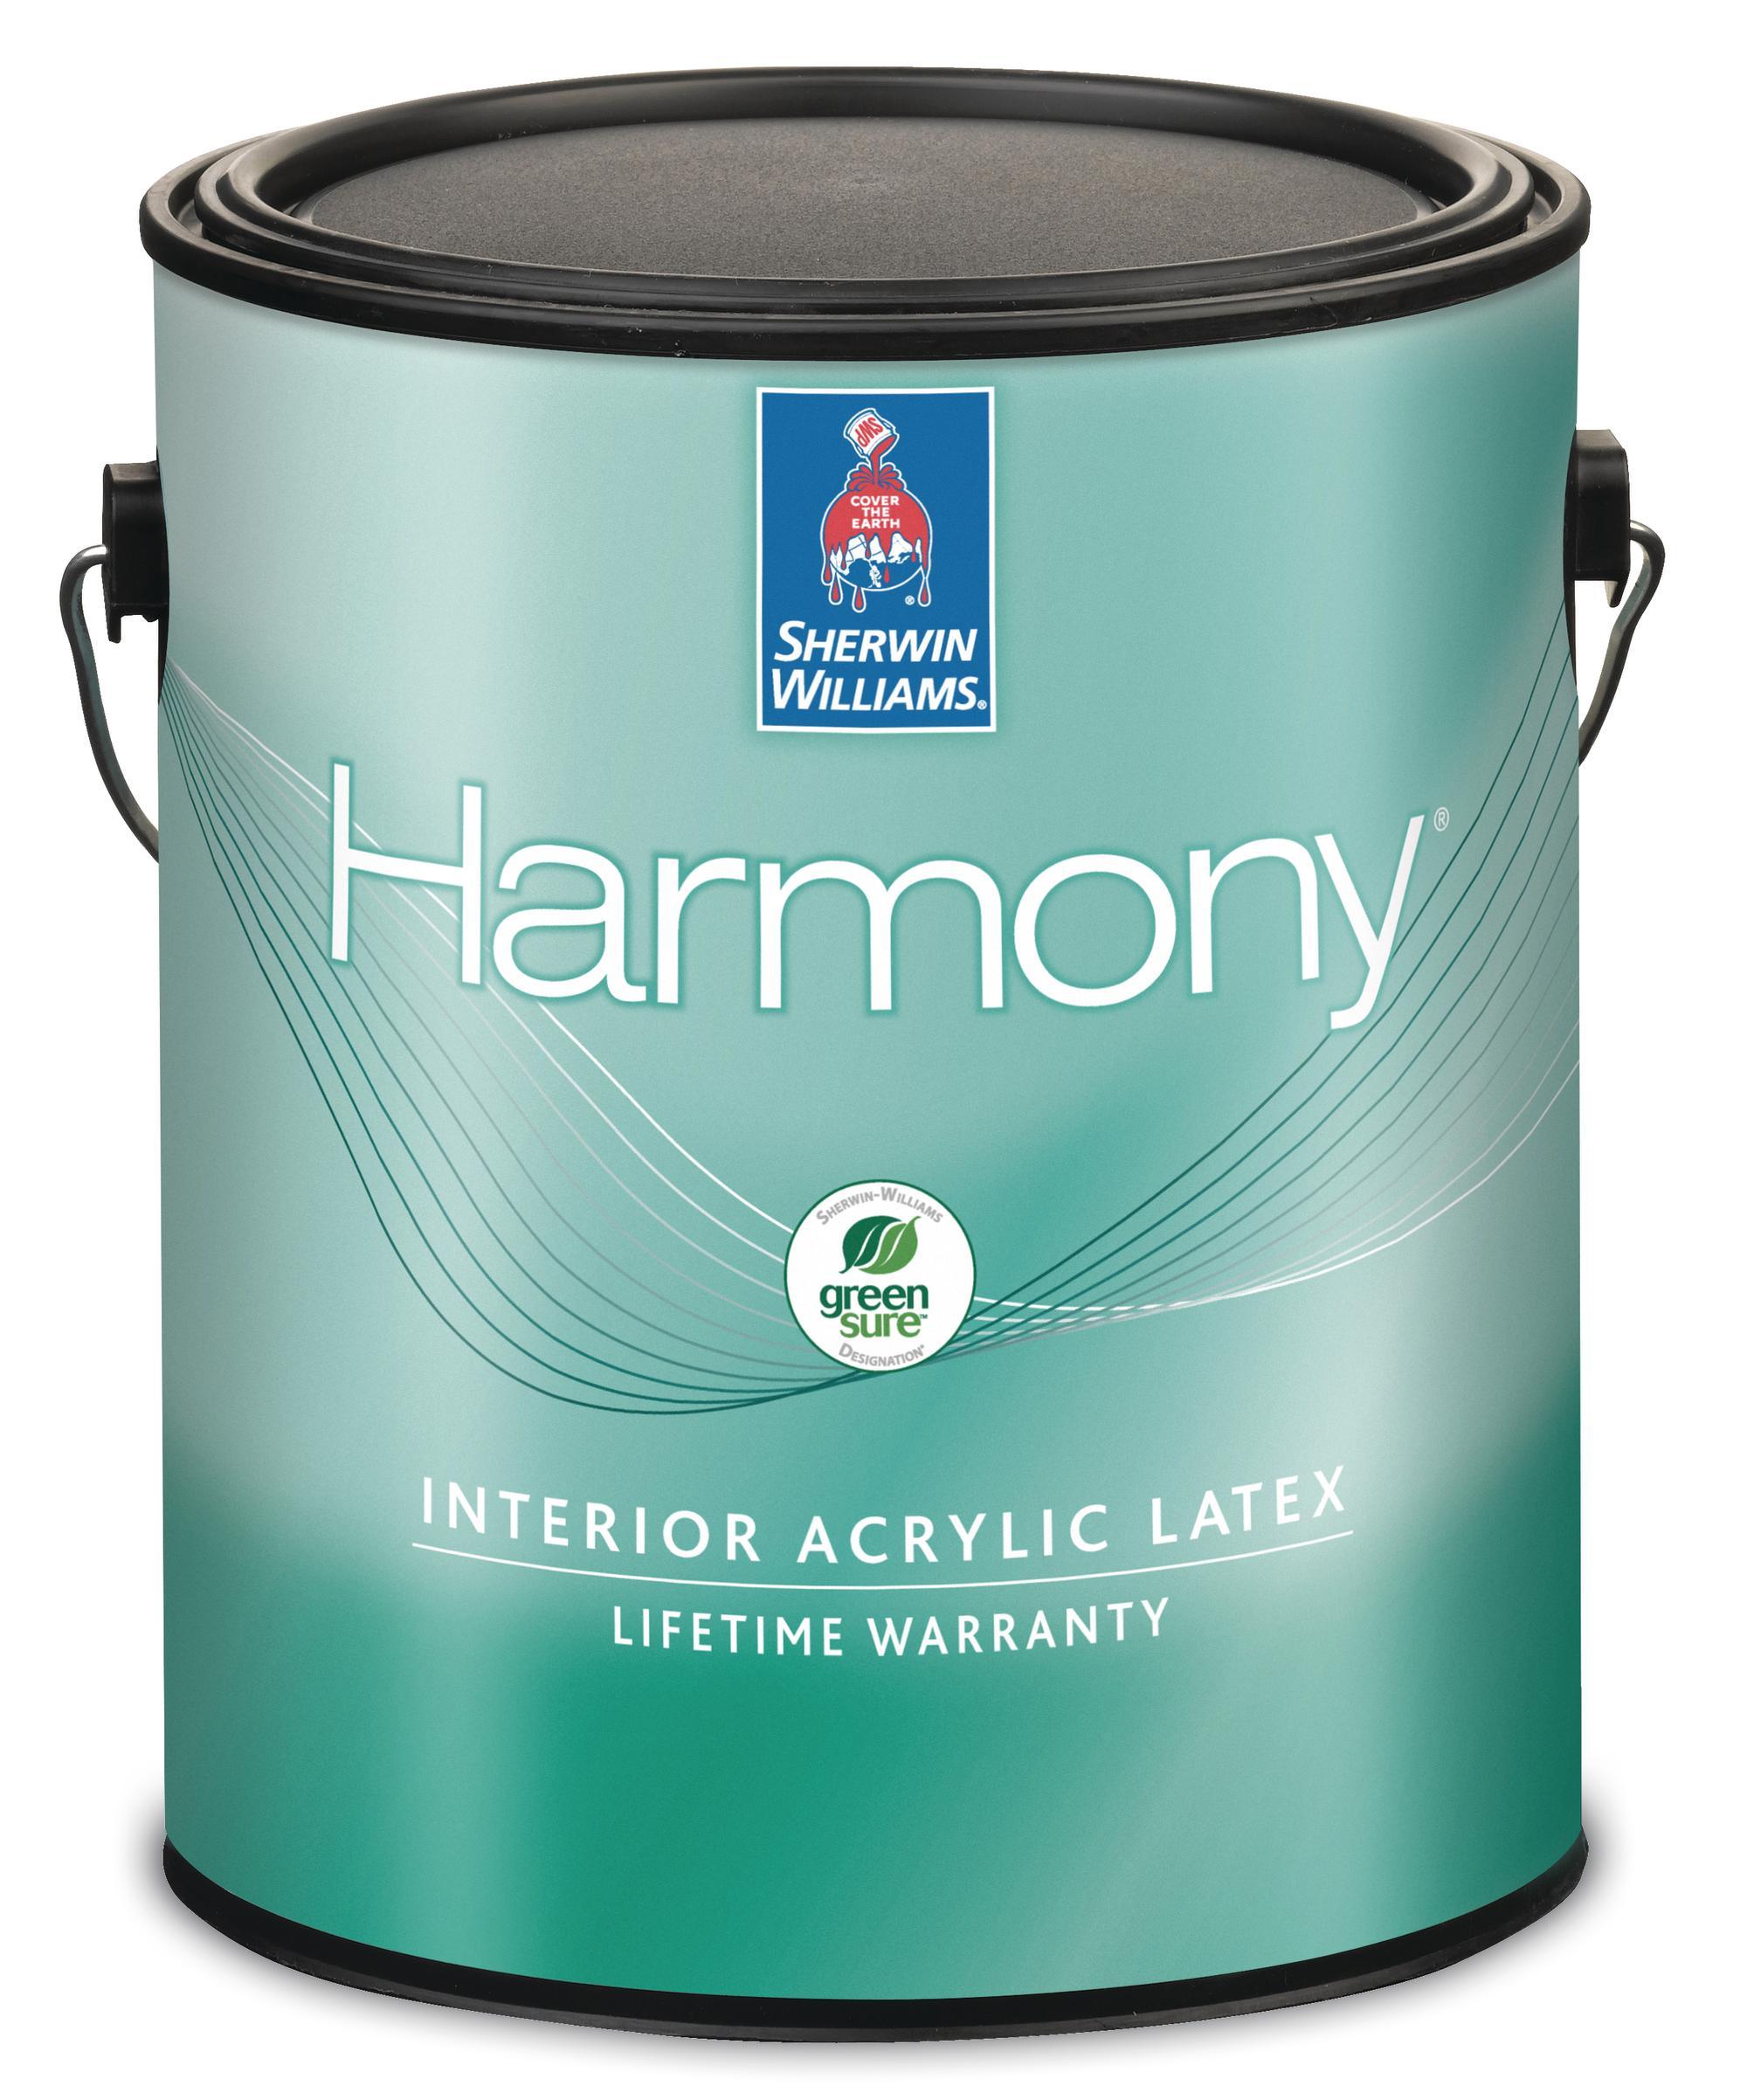 Sherwin Williams Vs Behr Interior Paint: Sherwin-Williams Reformulated Harmoney Latex Paint